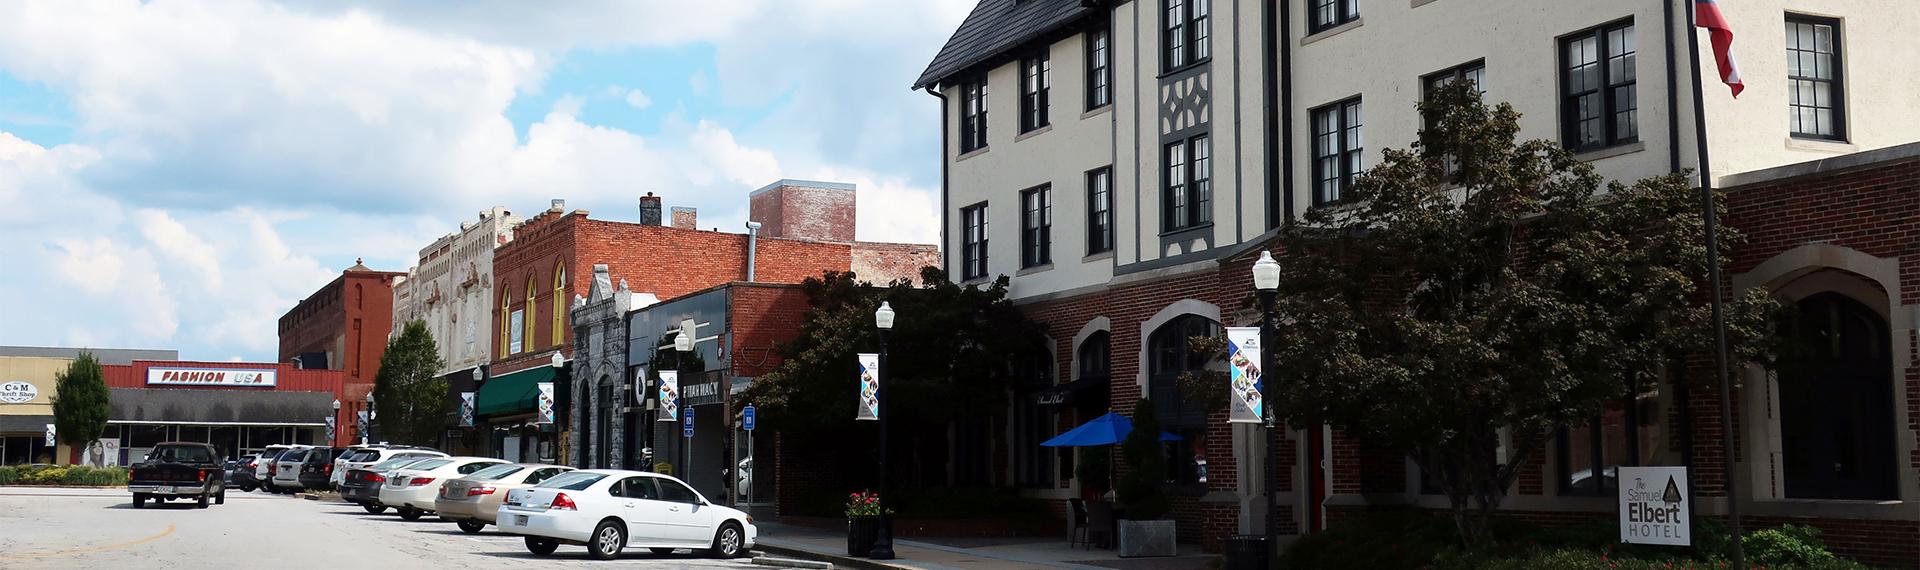 Downtown Elbert, GA